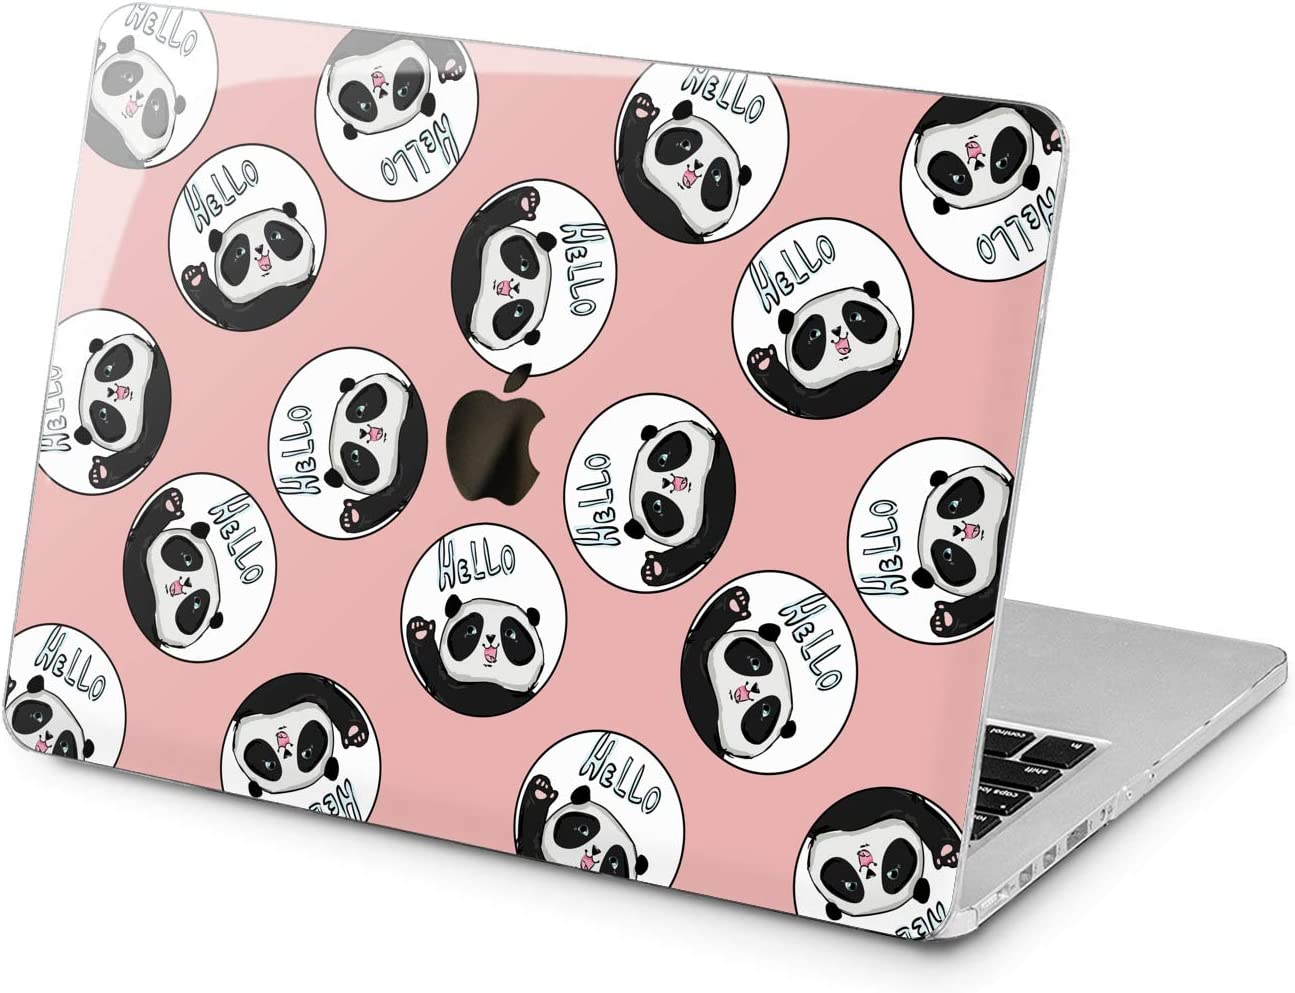 Lex Altern Hard Case for Apple MacBook Pro 15 Air 13 inch Mac Retina 12 11 2020 2019 2018 2017 2016 Women Kawaii Hello Shell Cute Protective Panda Animal Pattern Laptop Bear Design Pink Plastic